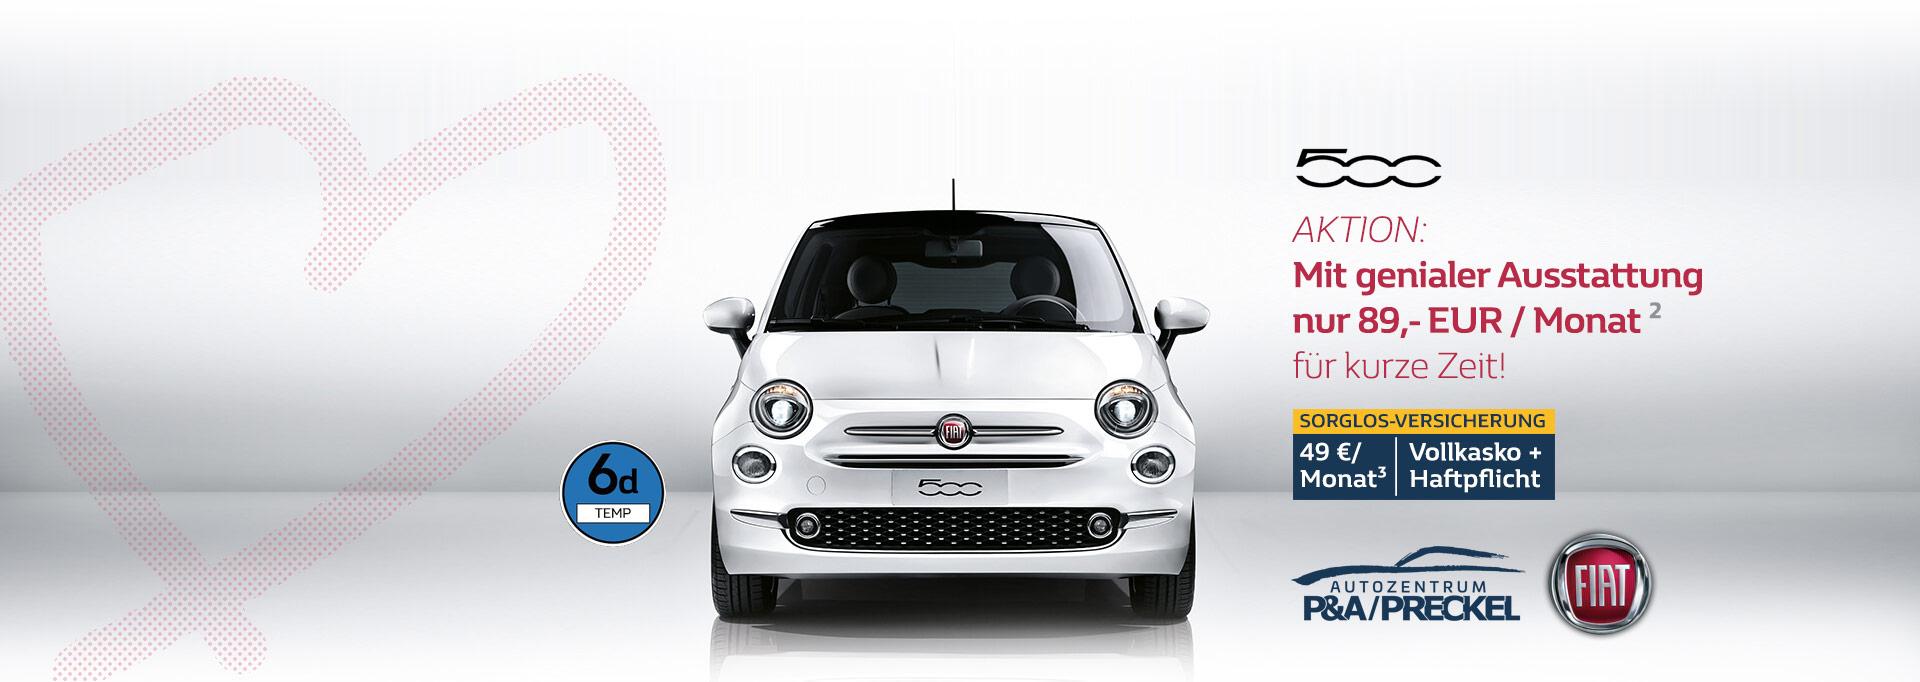 Fiat 500 Lounge Angebot 2019